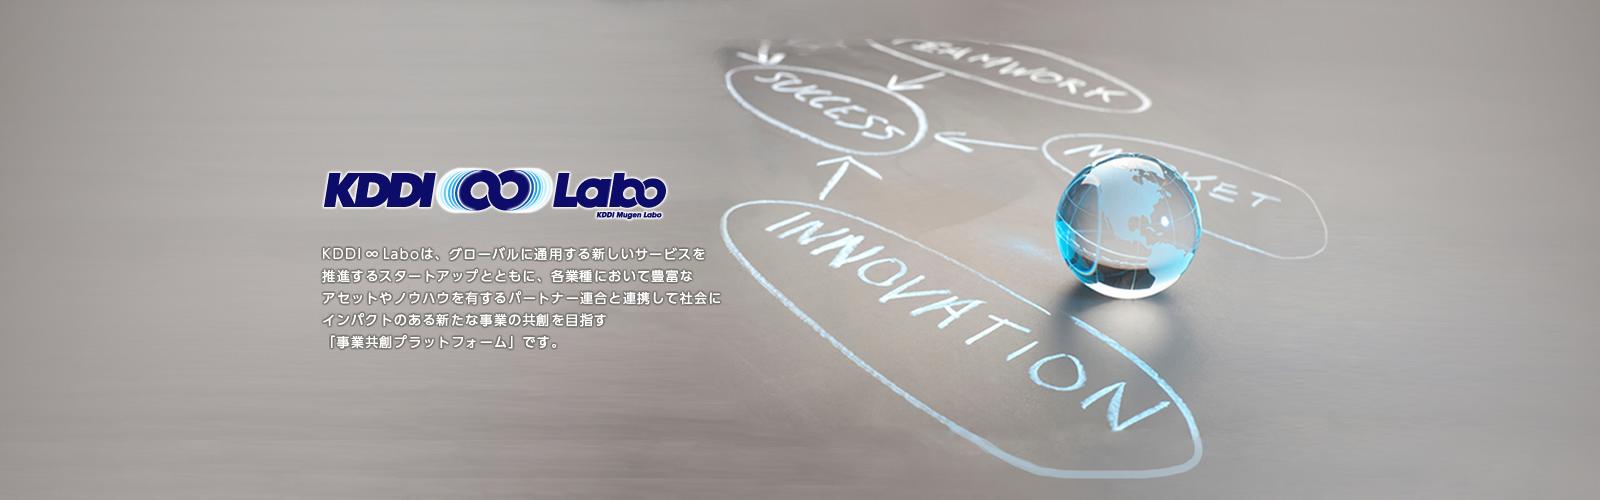 KDDI ∞ Laboは、グローバルに通用する新しいサービスを推進するスタートアップとともに、各業種において豊富なアセットやノウハウを有するパートナー連合と連携して社会にインパクトのある新たな事業の共創を目指す「事業共創プラットフォーム」です。